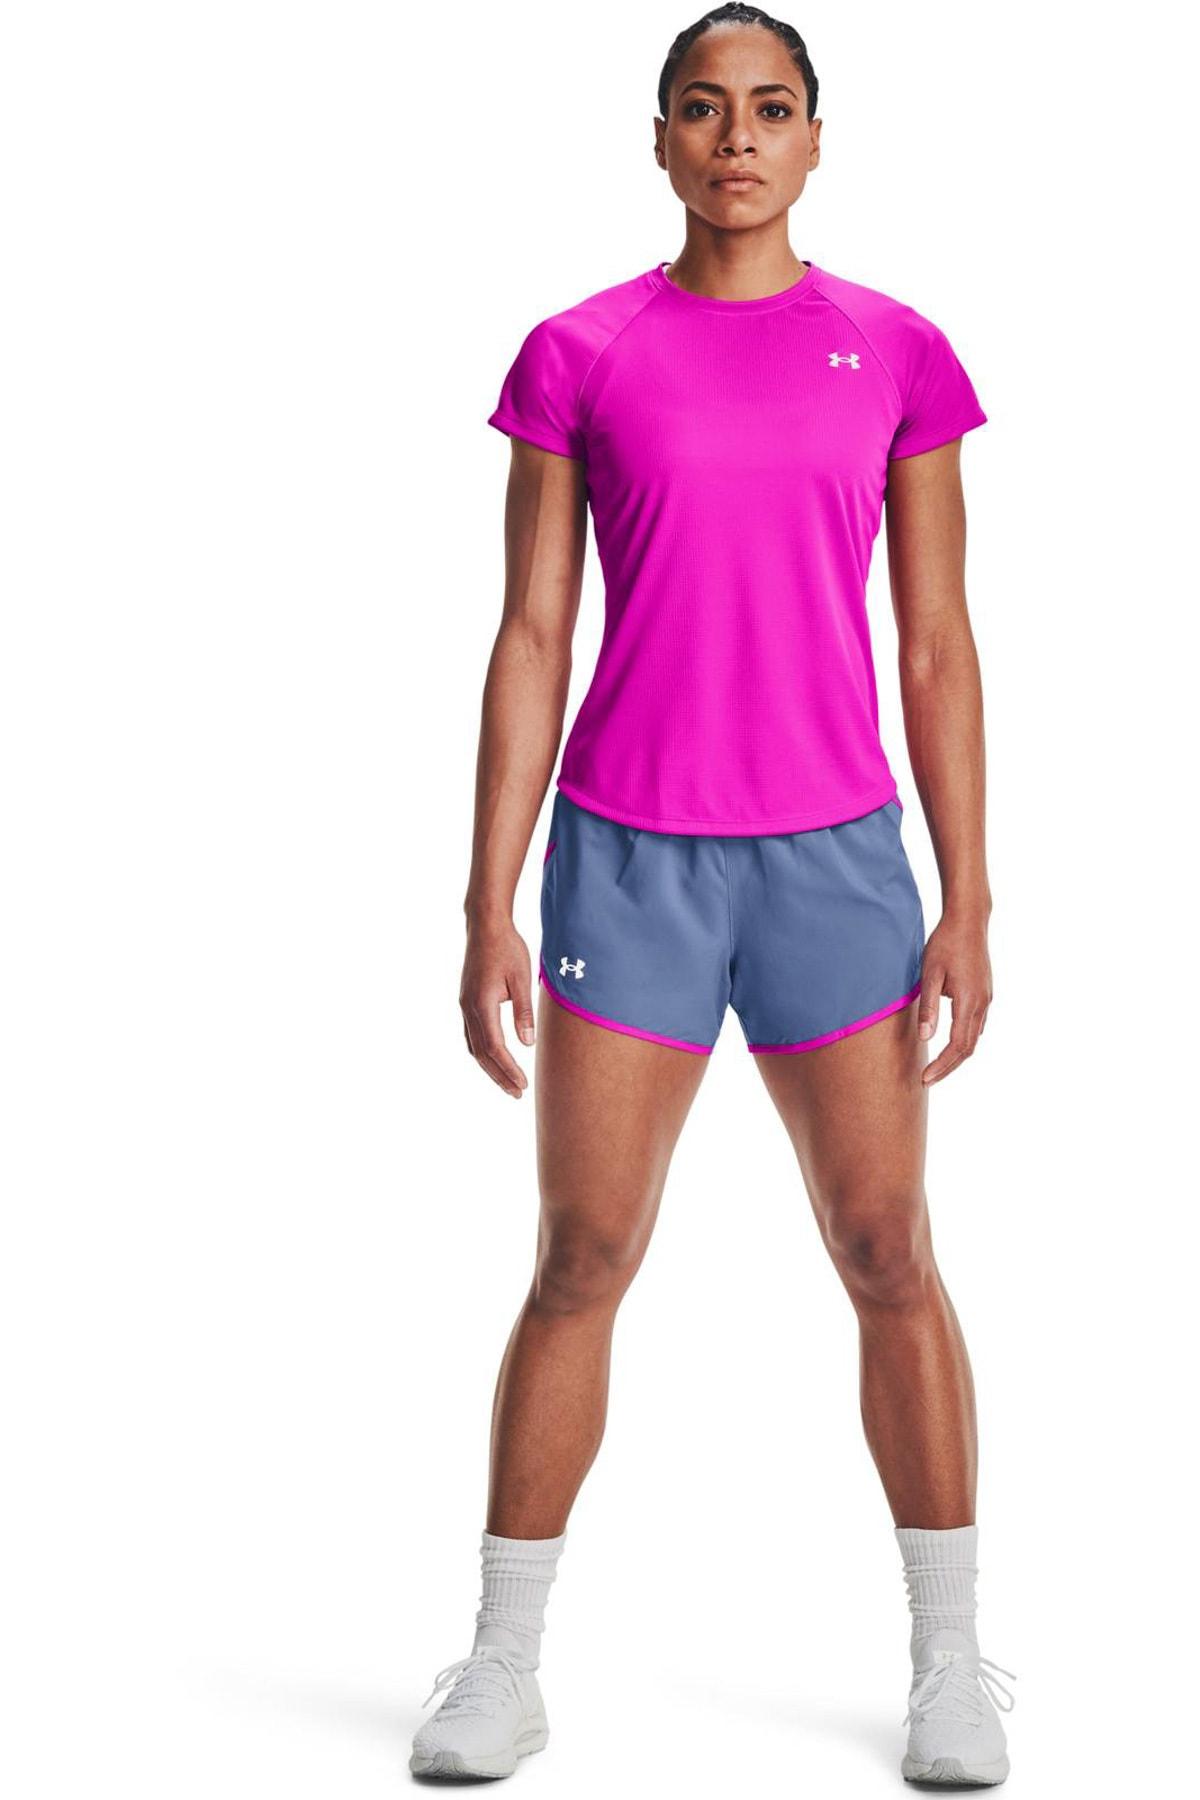 Under Armour Kadın Spor T-Shirt - UA Speed Stride Short Sleeve - 1326462-660